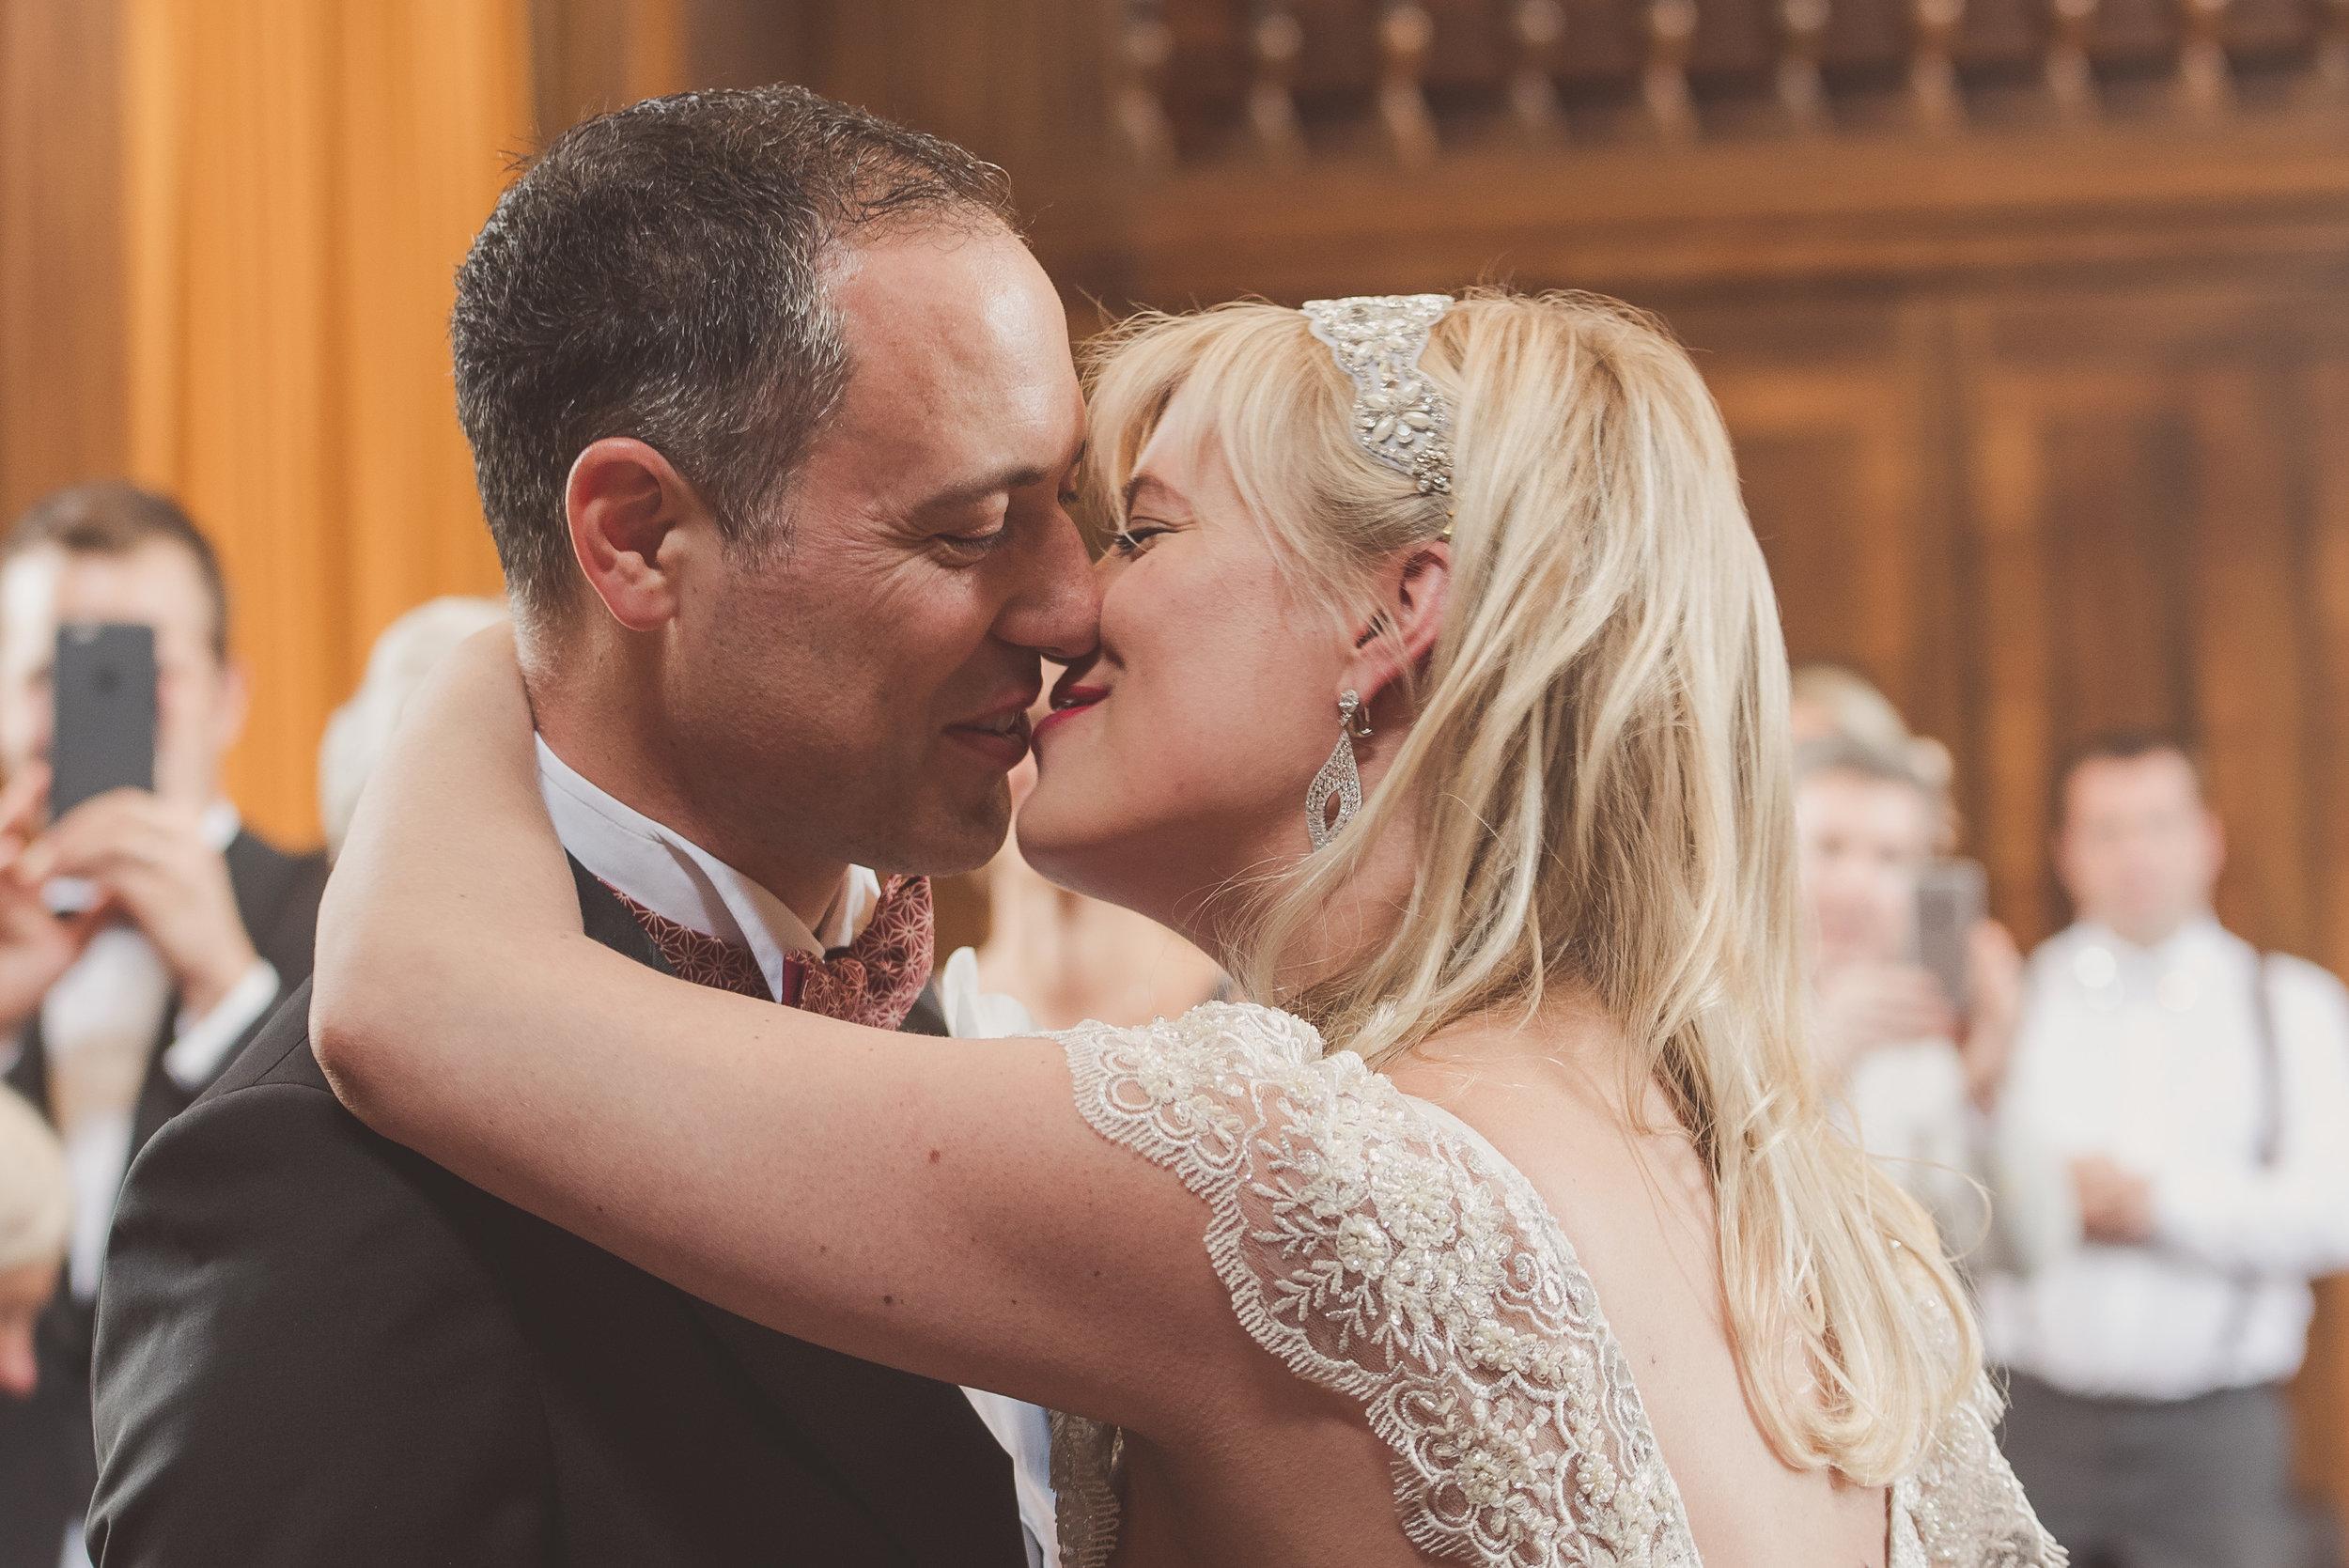 Stoke Newington Towm Hall wedding